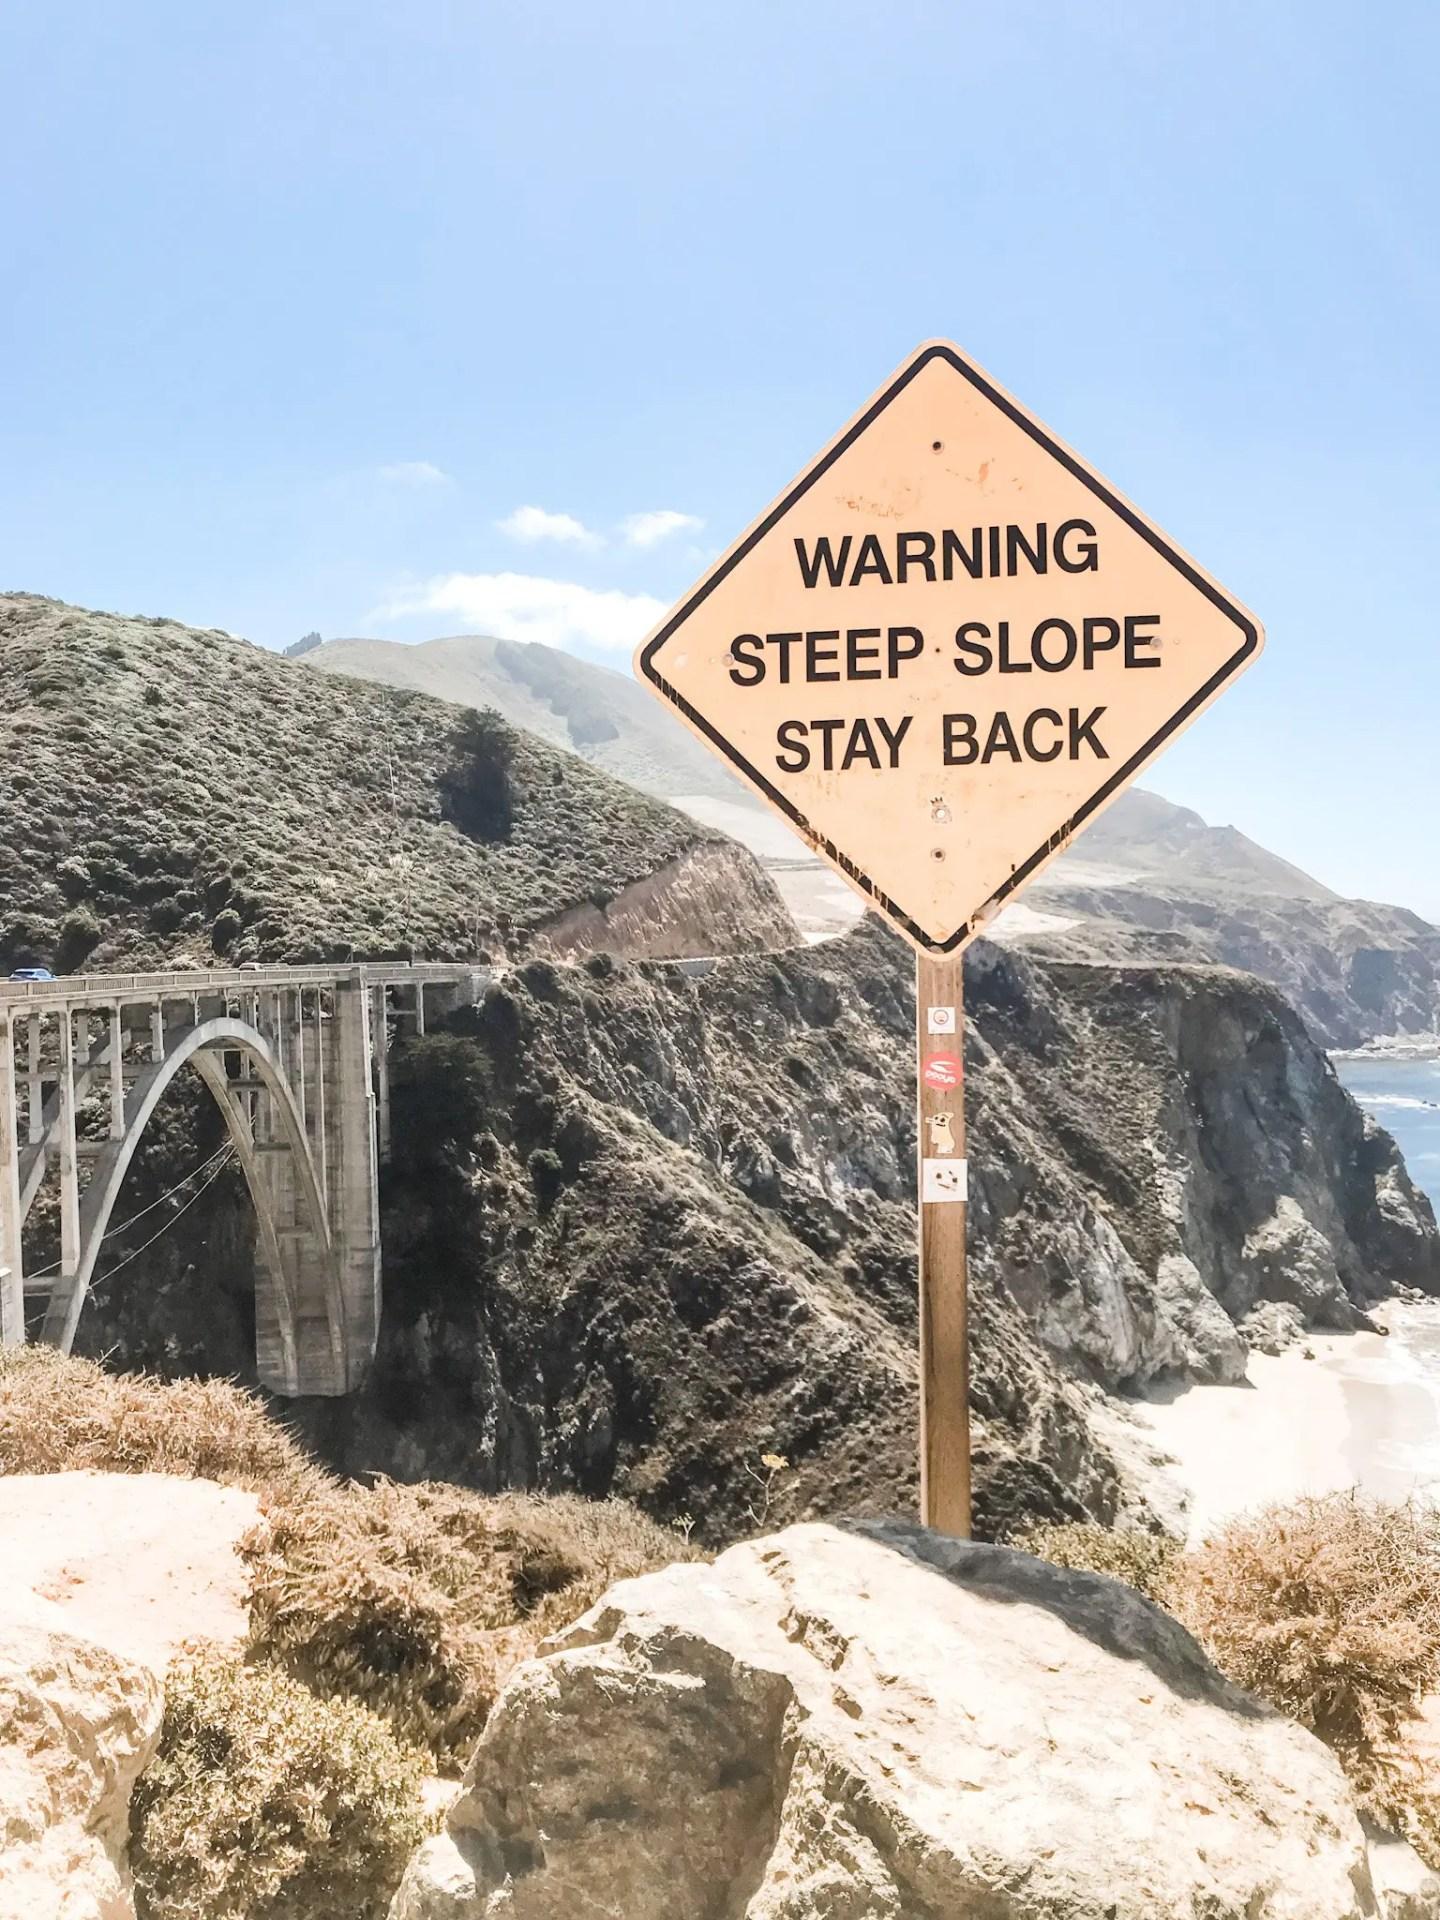 Heed their warning, the cliffs surrounding Bixby Bridge are no joke!